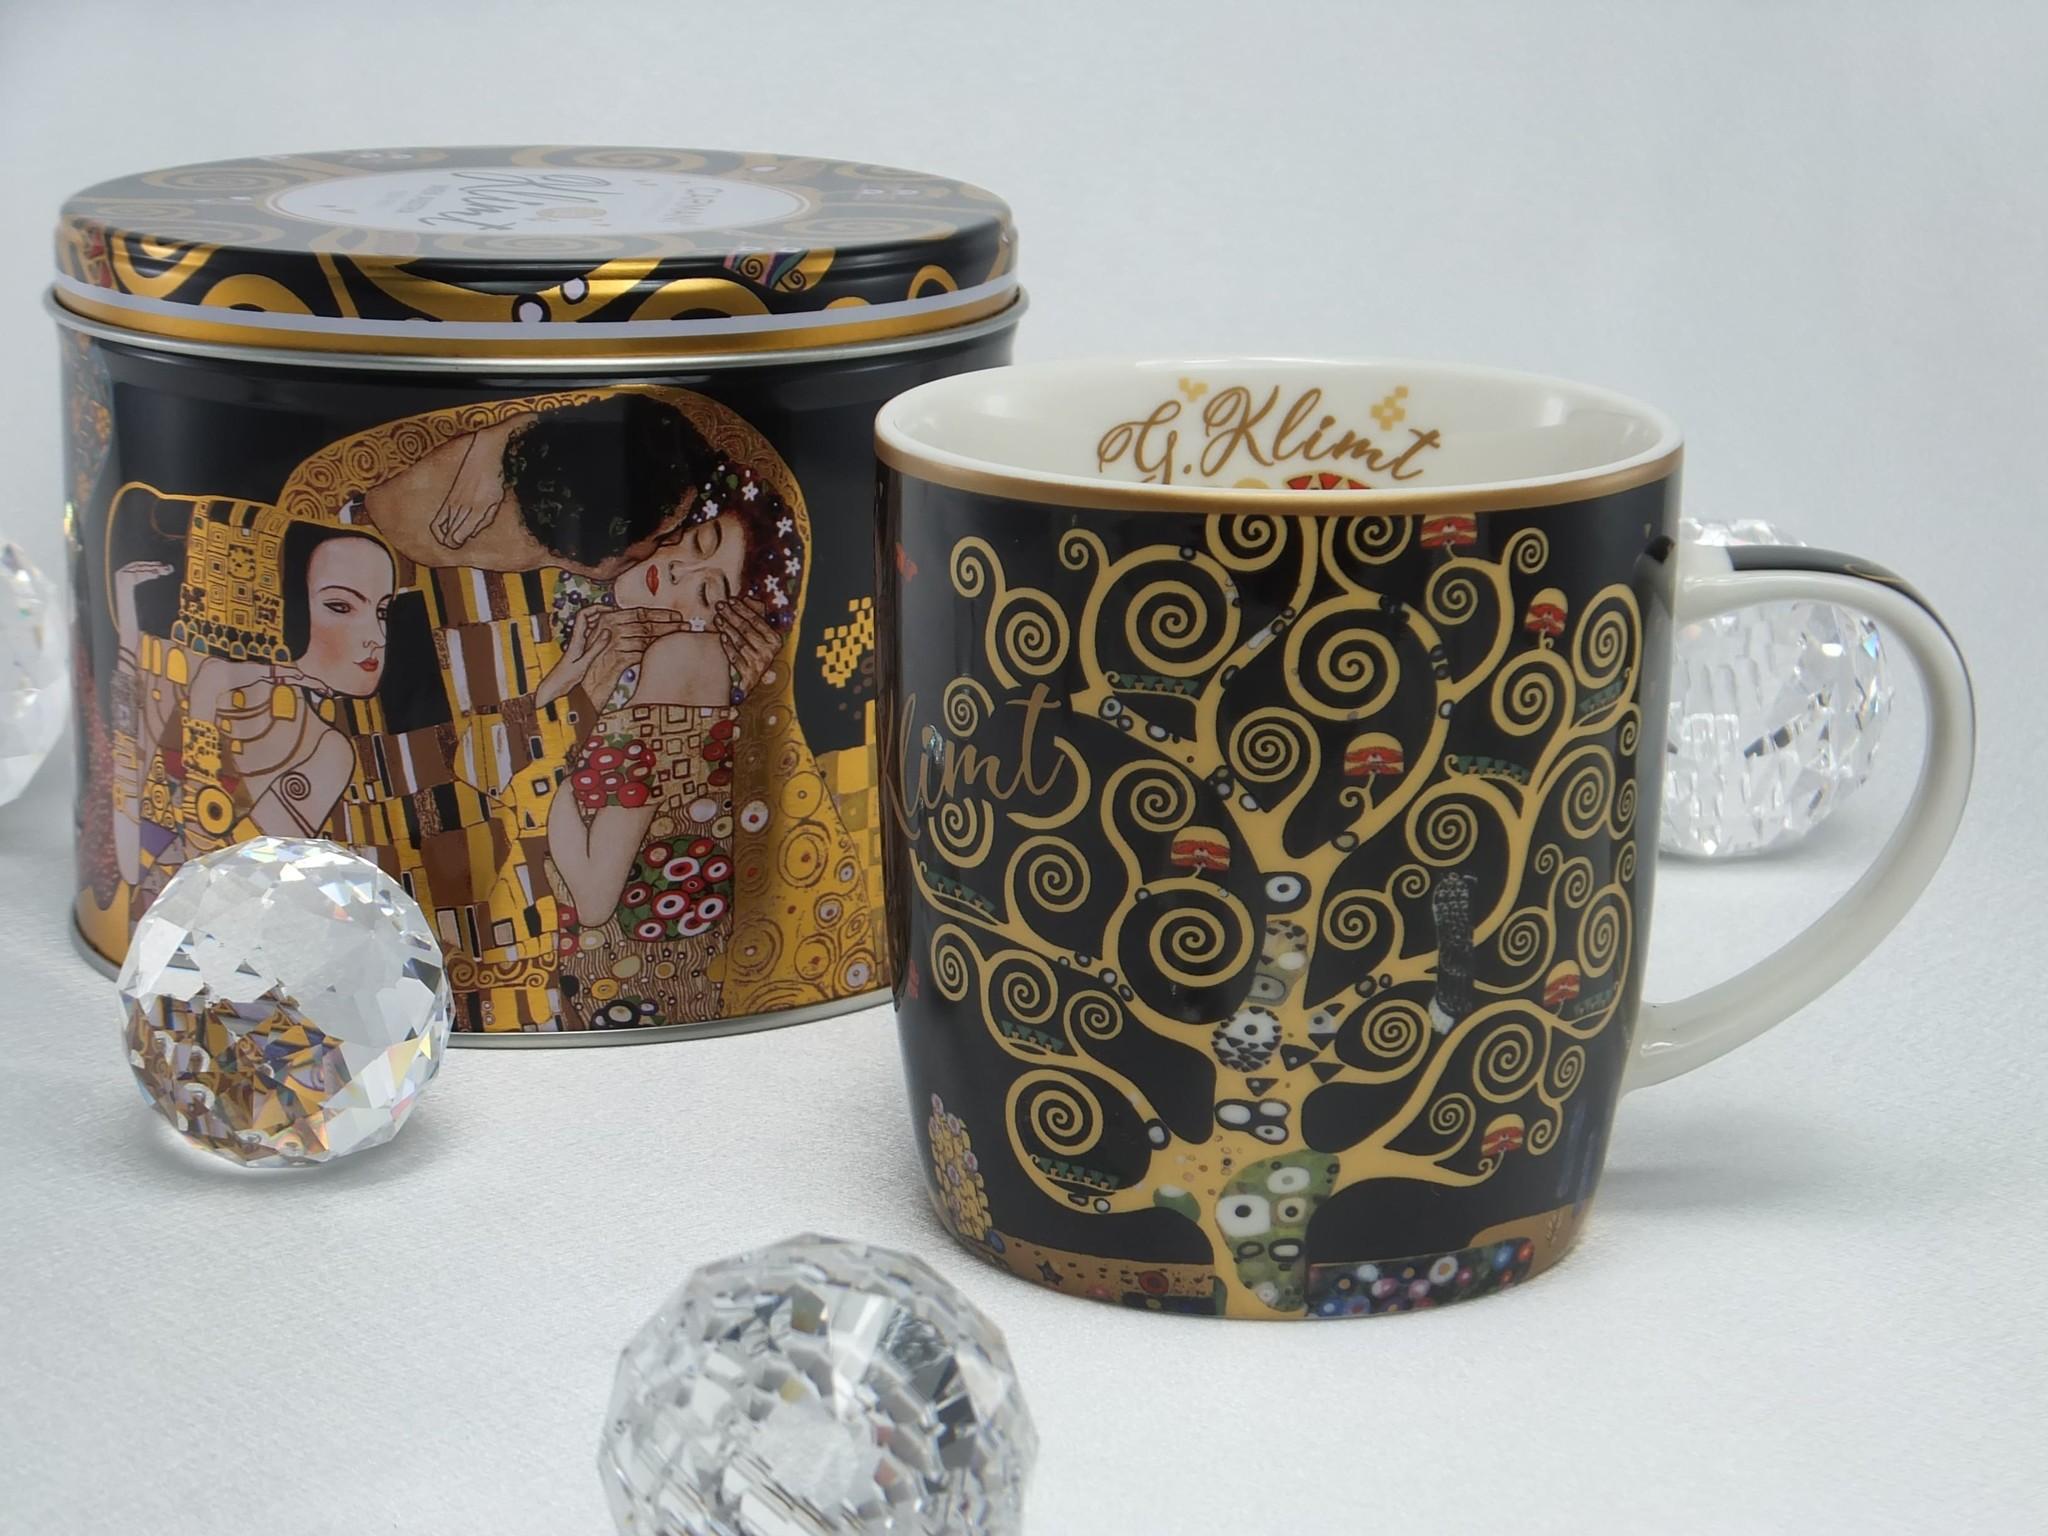 CARMANI - 1990 Gustav Klimt - Tree of Life - Porcelain Coffee Cup in a Metal Box